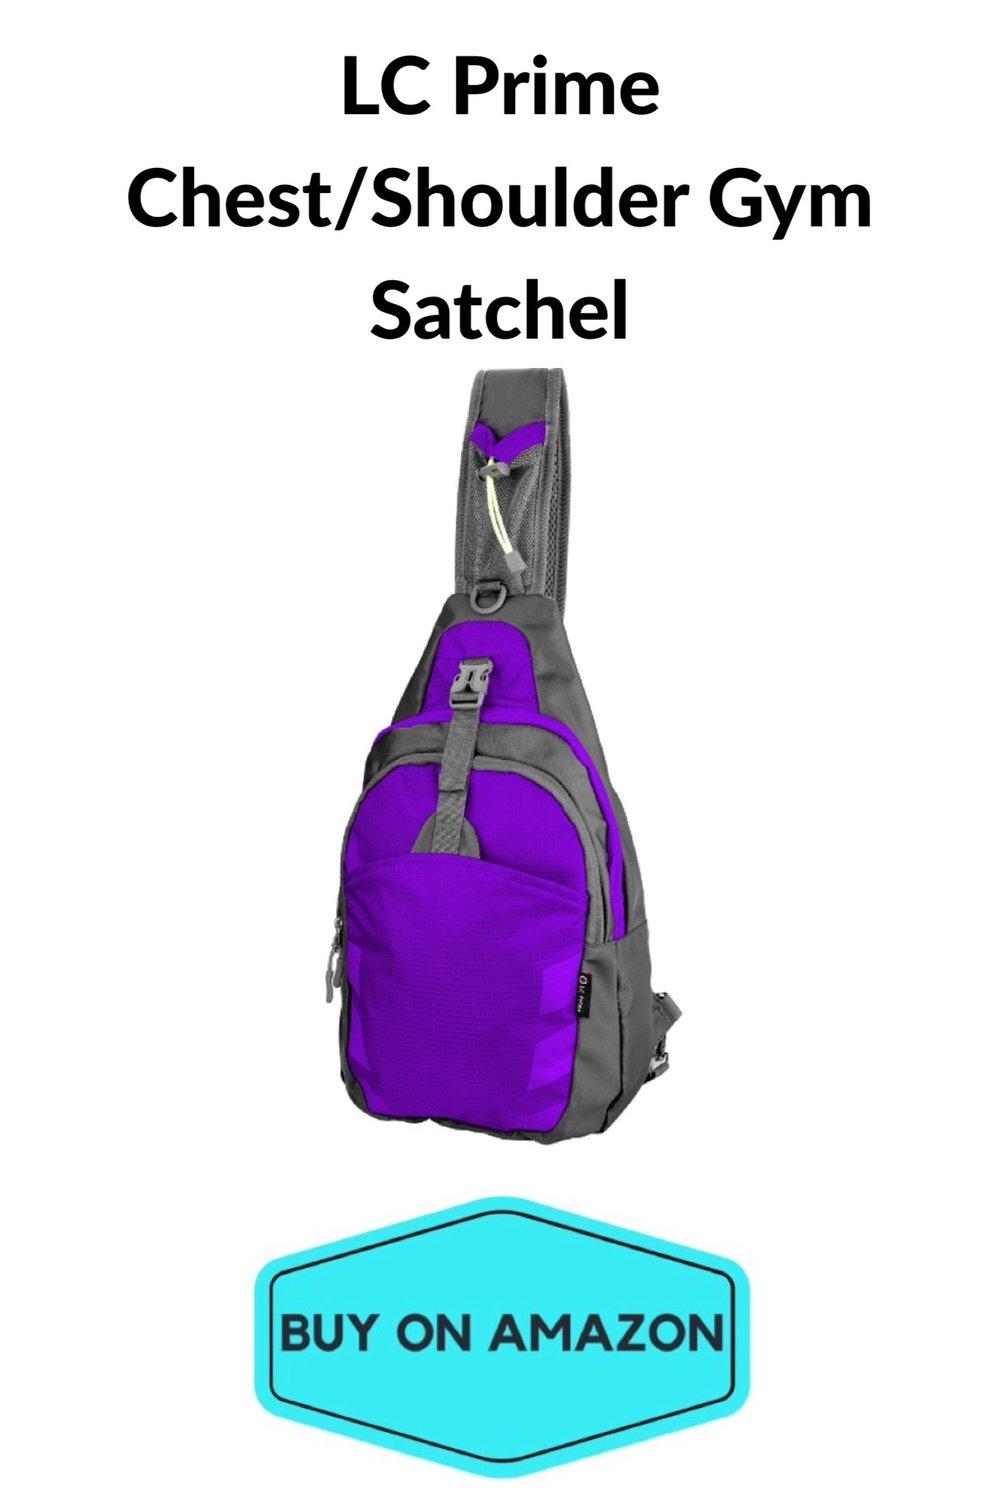 LC Prime Chest/Shoulder Gym Satchel